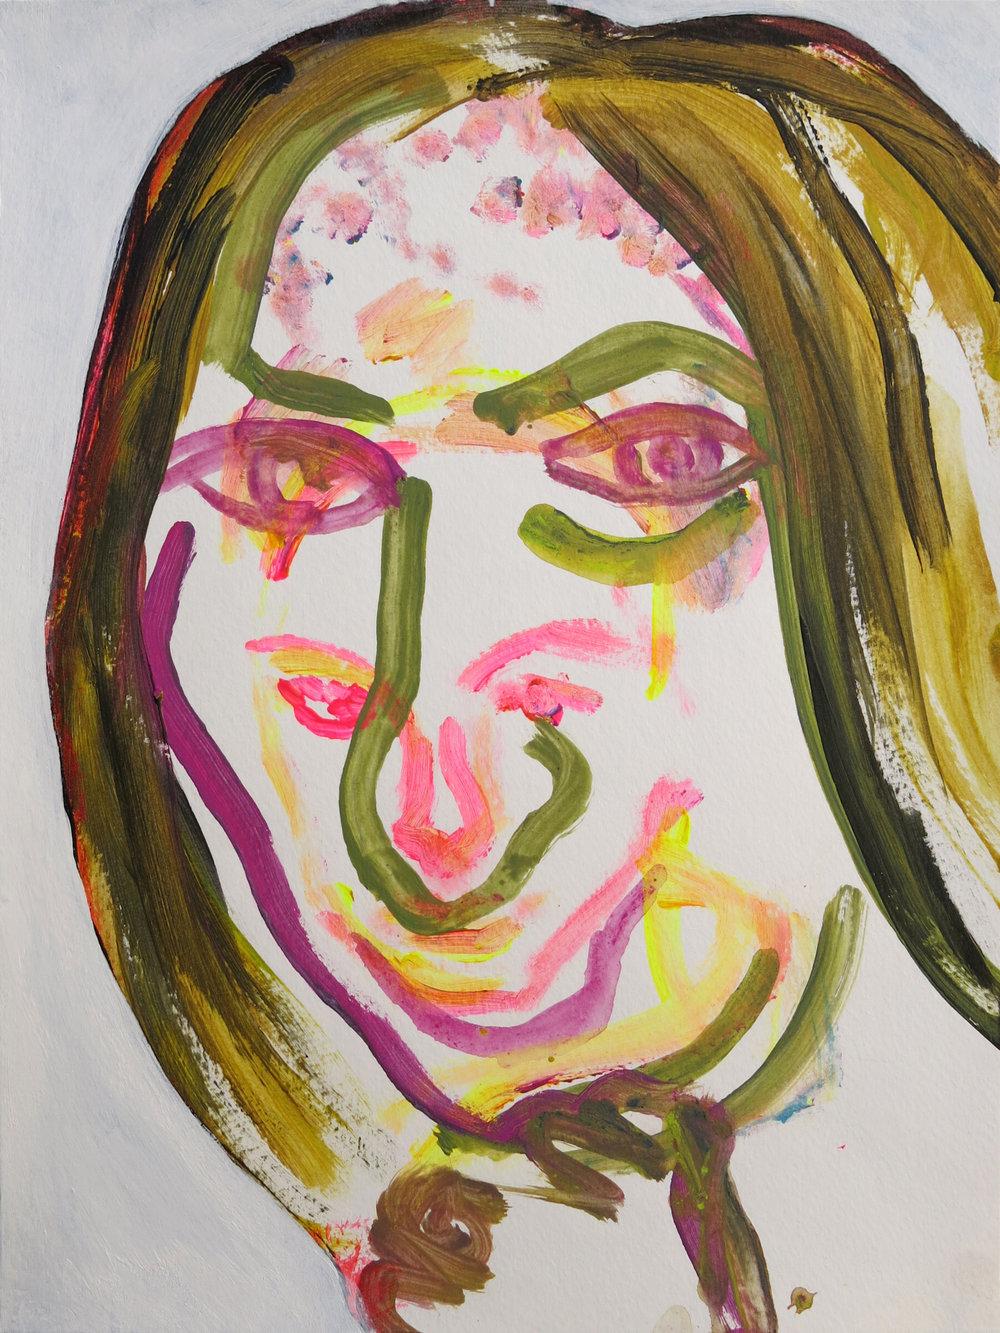 Barbra Streisand Portrait #211